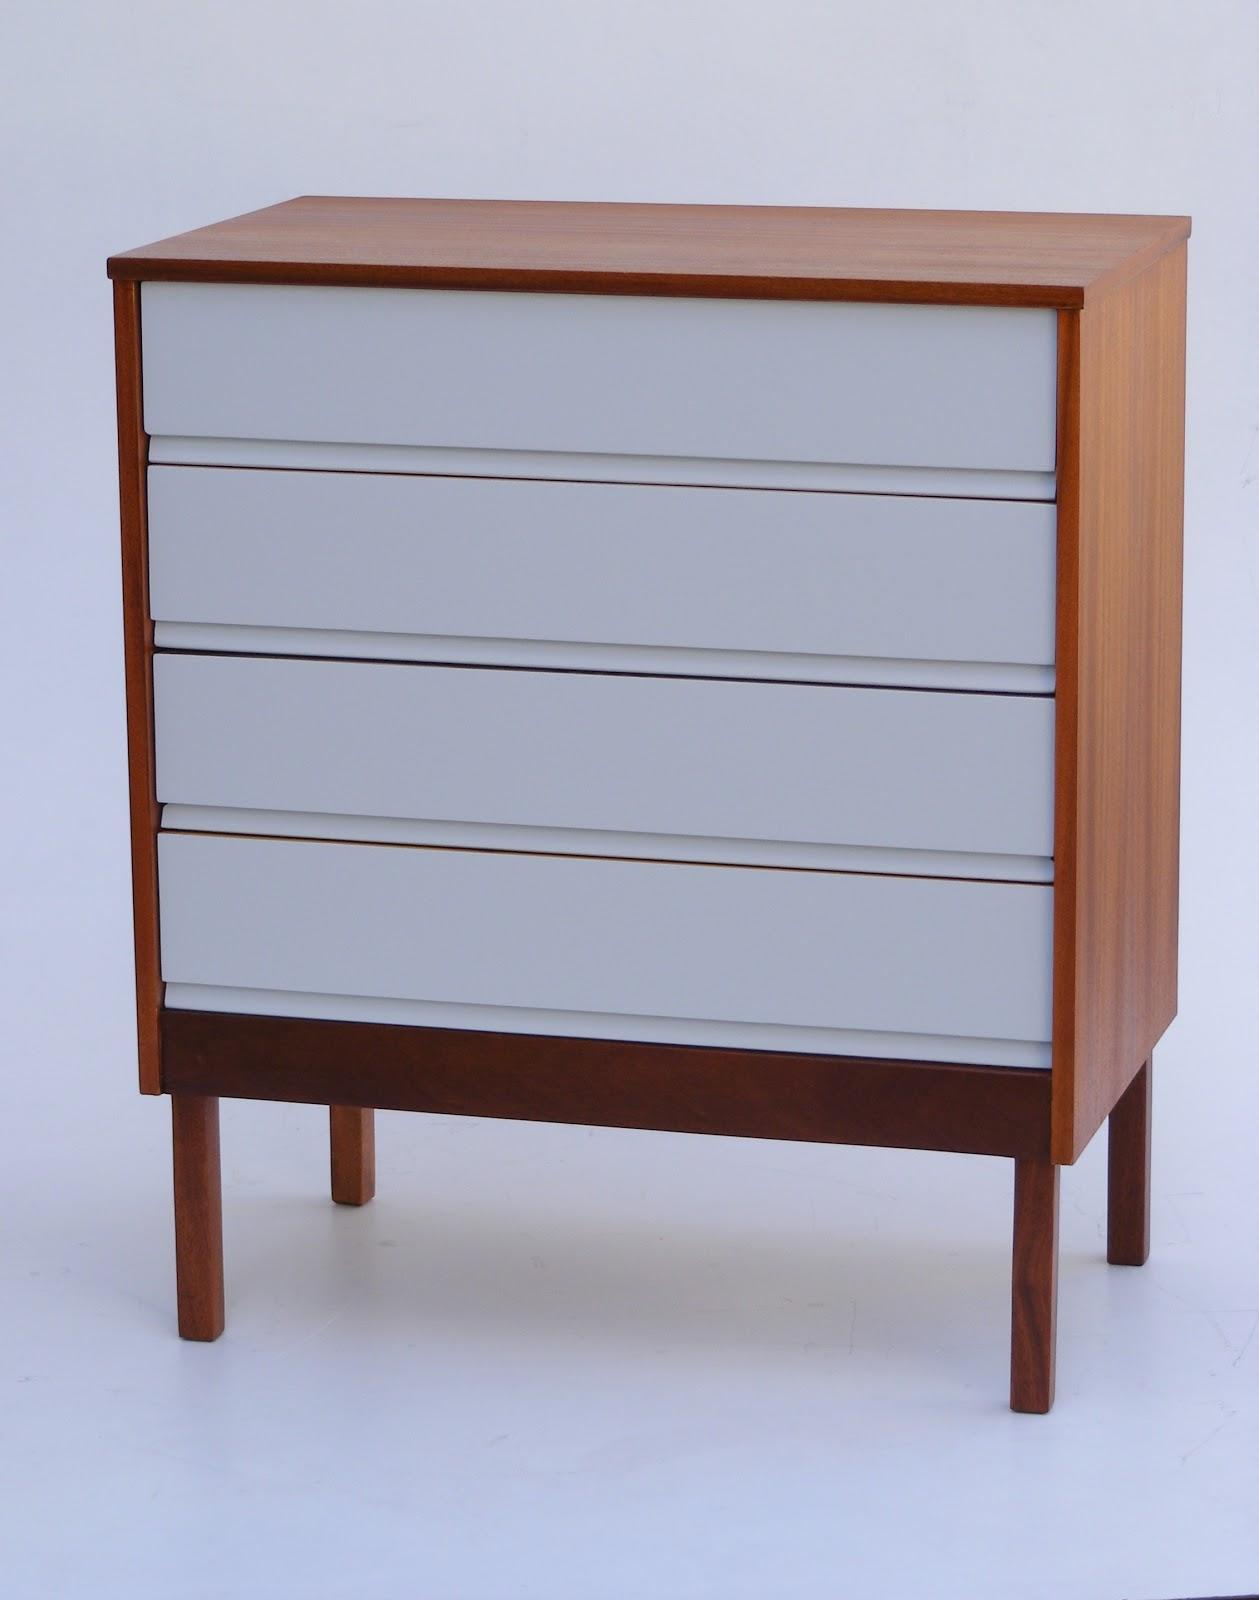 This week's new vintage furniture stock at Vamp - 23 November 2012